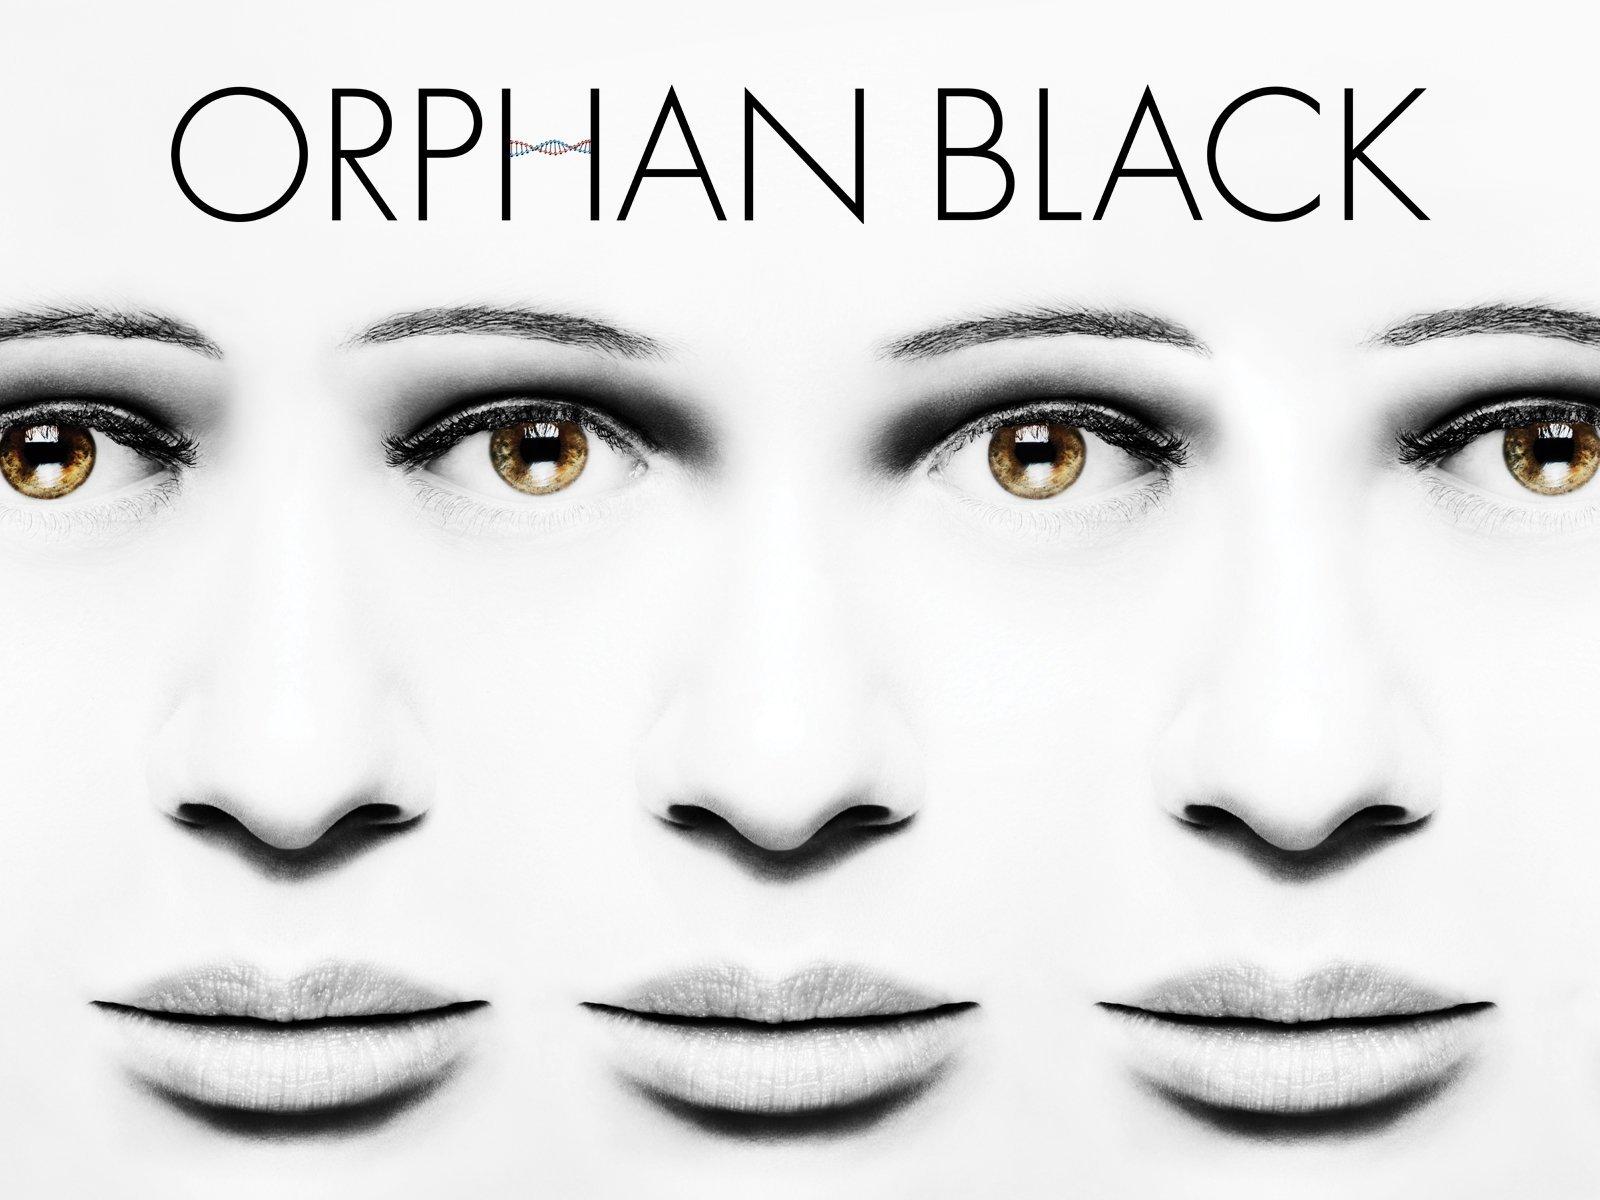 download orphan black season 1 episode 2